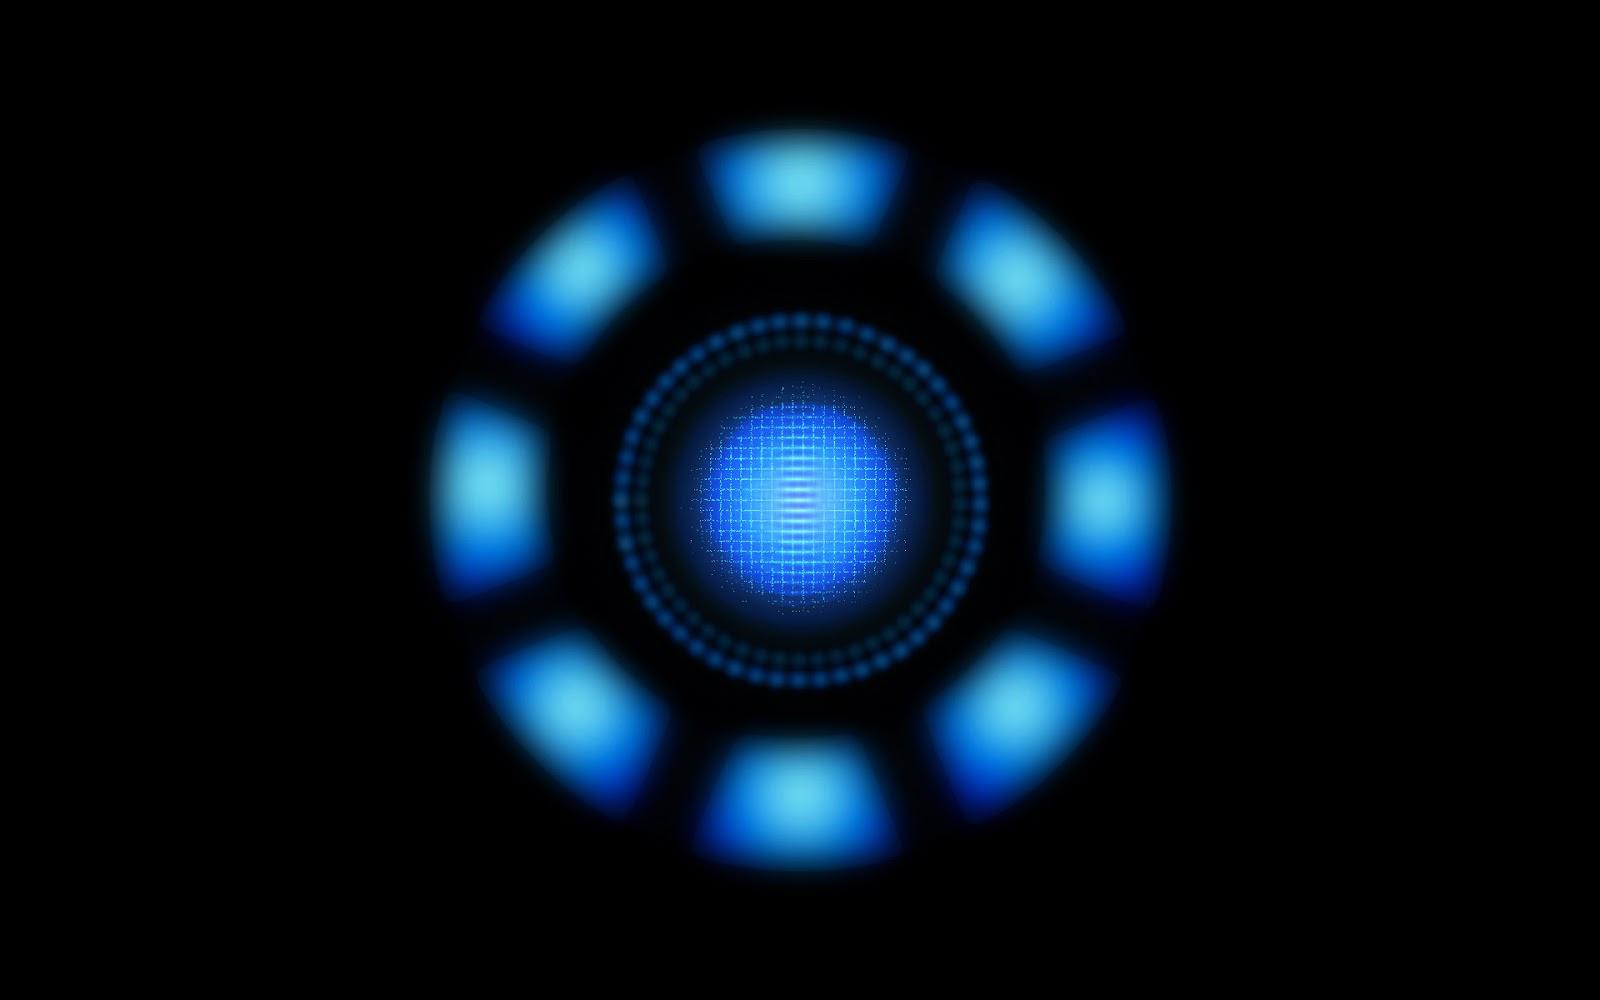 http://2.bp.blogspot.com/-3QaqPwEUQho/UOr8kwsxeWI/AAAAAAAAF1w/wrk5LZ6t5L4/s1600/Iron+man+3+(9).jpg